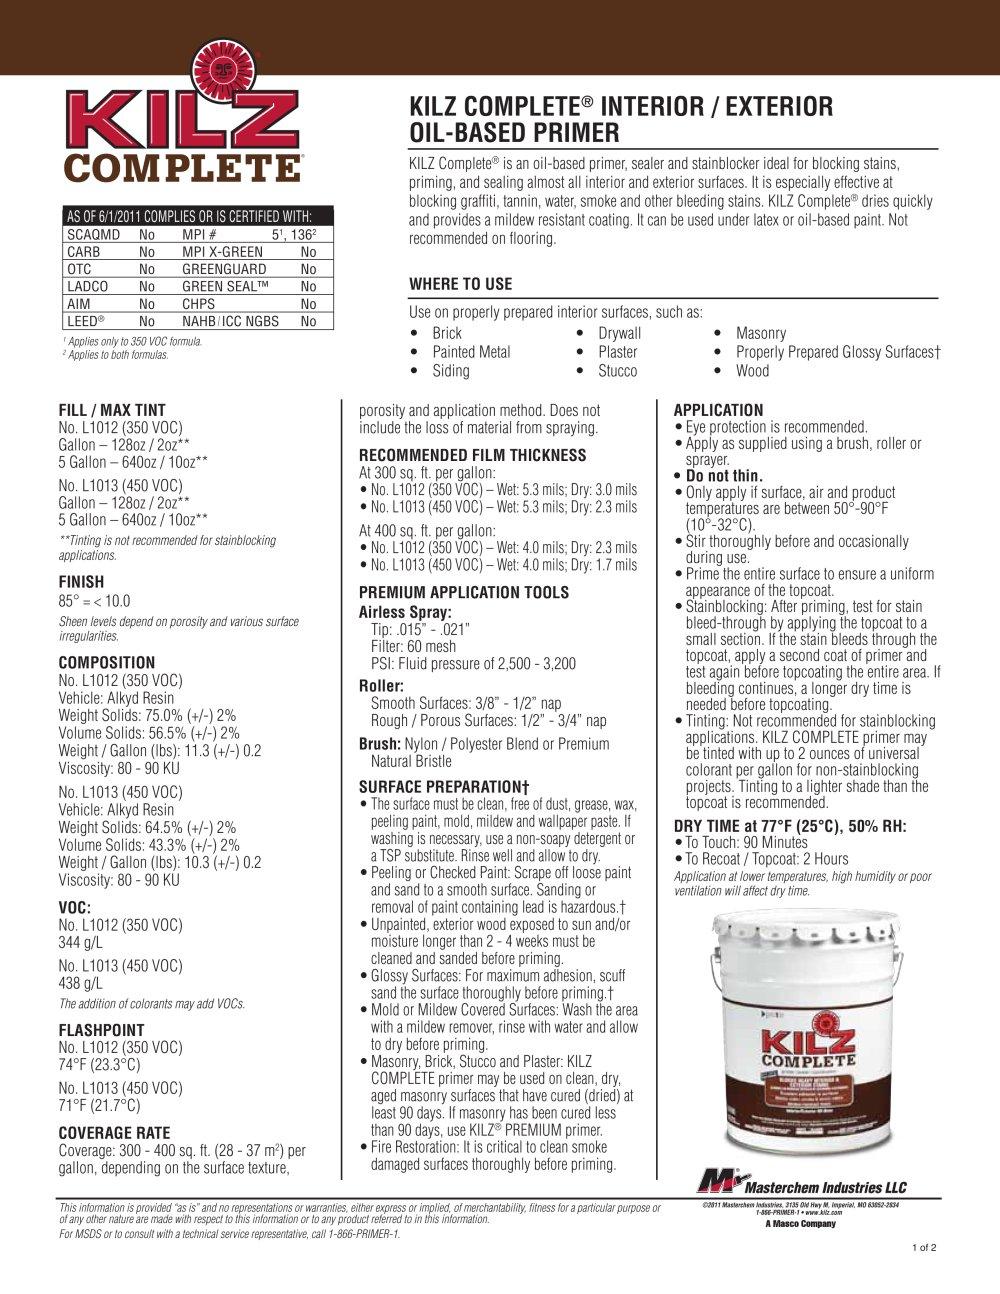 KILZ COMPLETE® INTERIOR / EXTERIOR OIL BASED PRIMER   1 / 4 Pages